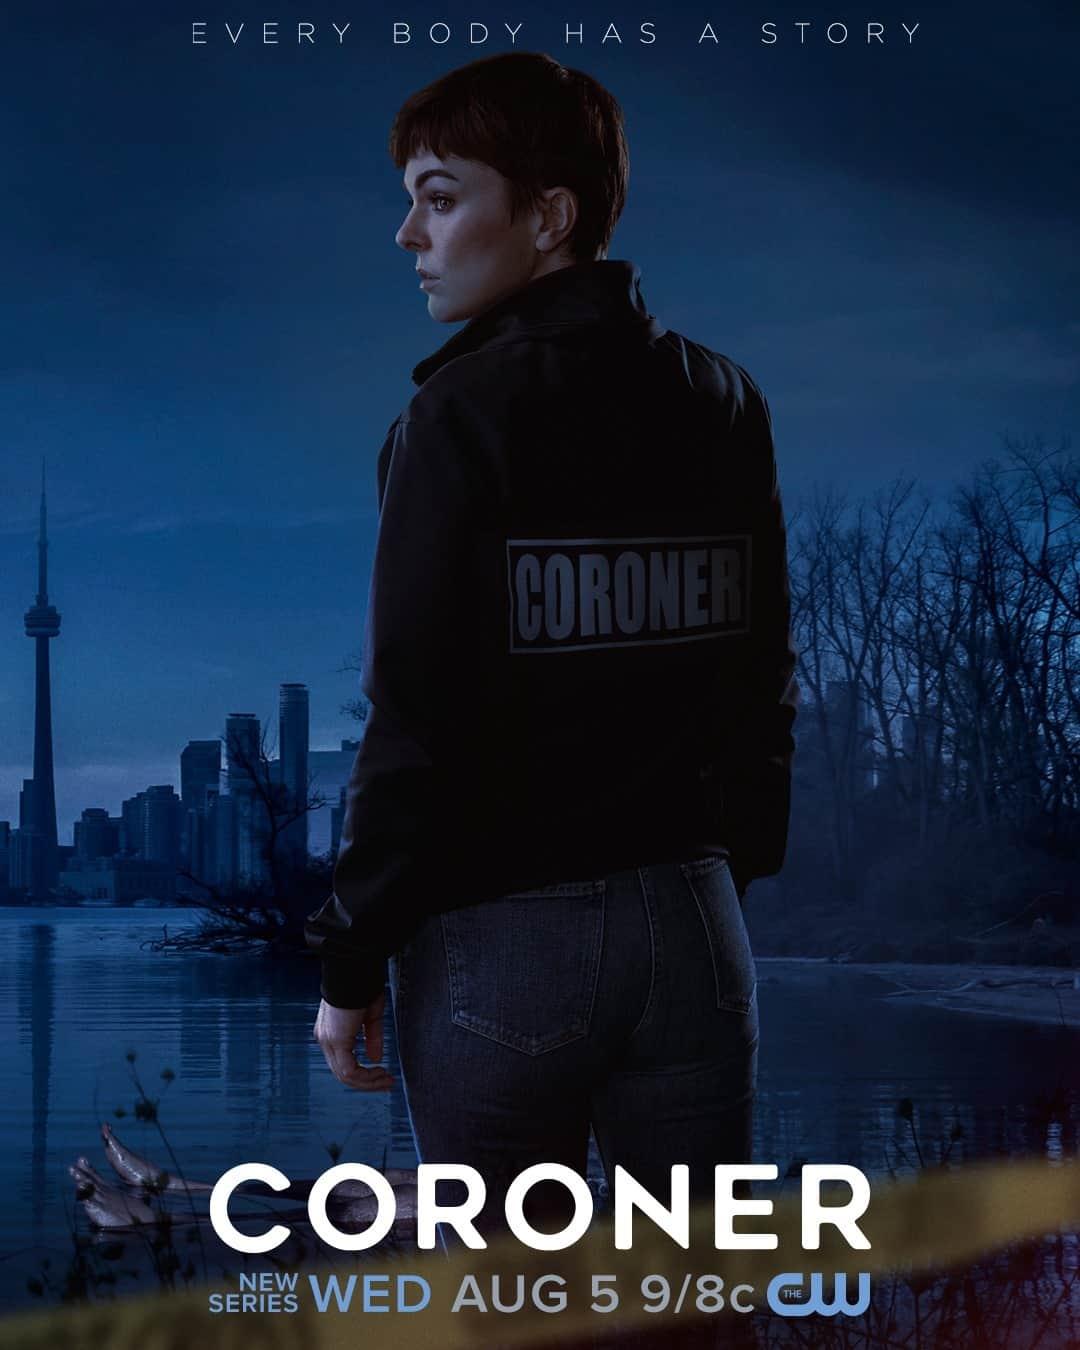 Coroner Season 1 (2019) ชันสูตรพลิกศพ ปี1 ซับไทย EP1 – EP6